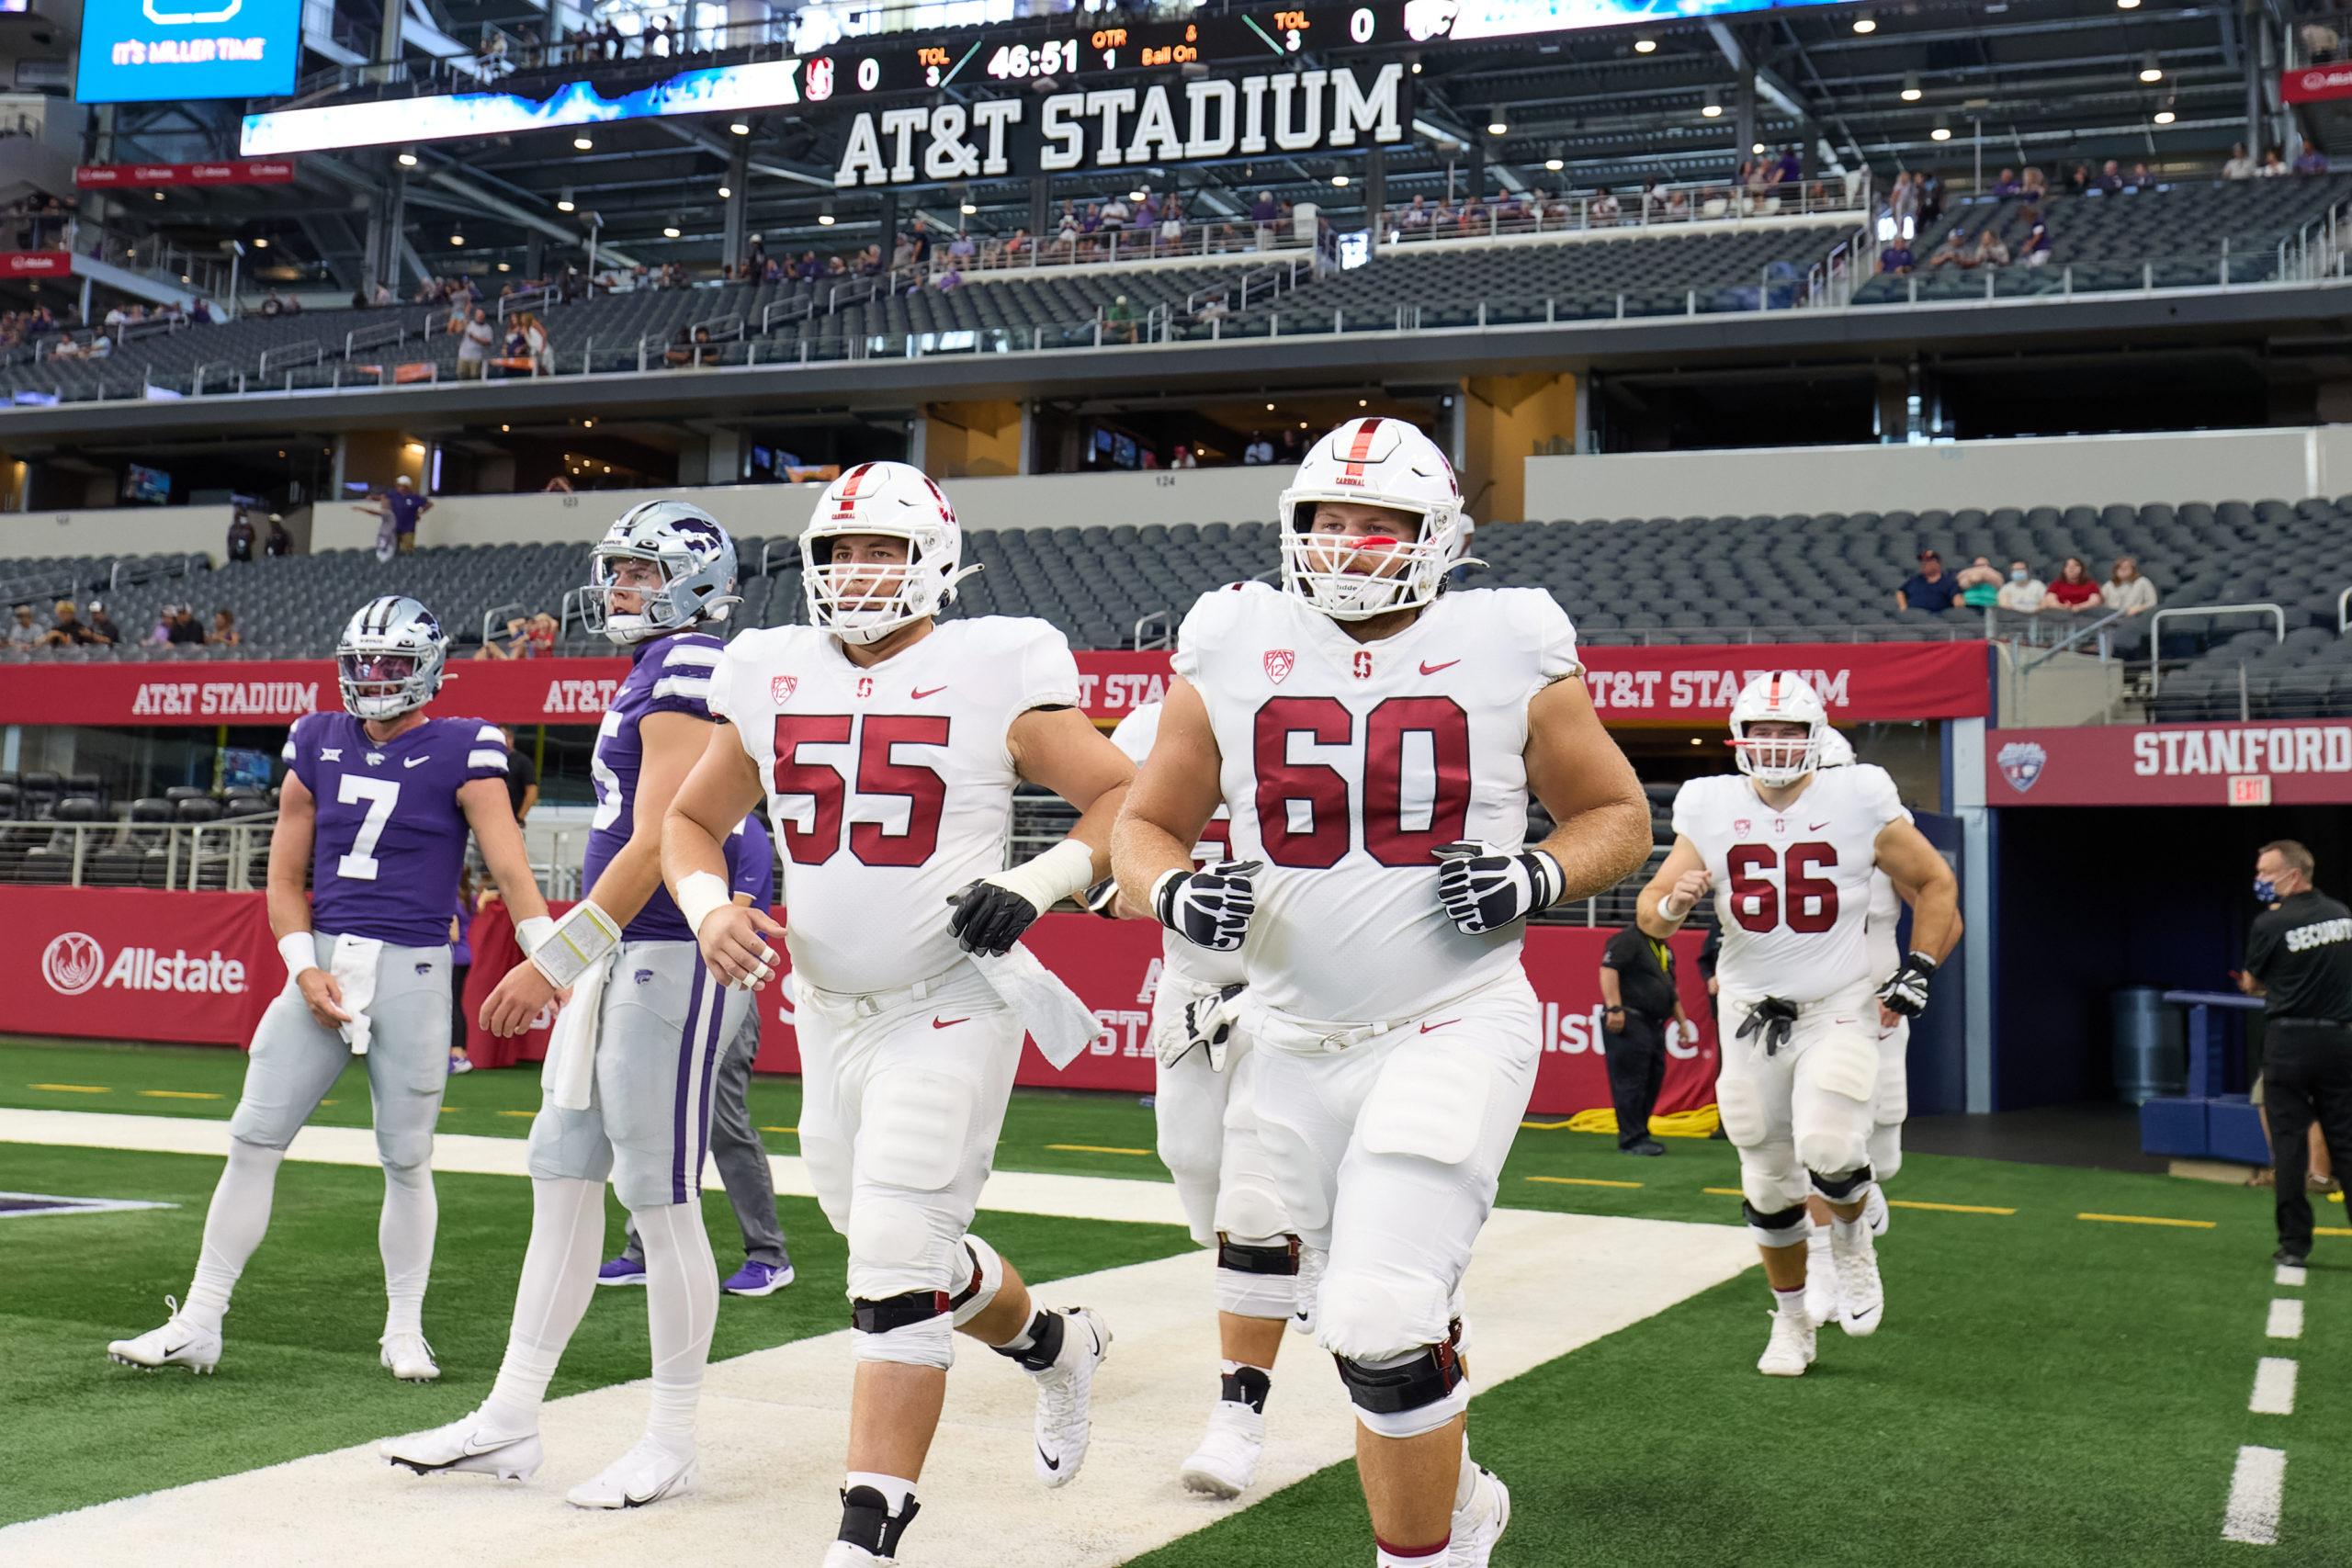 Stanford football's Drake Metcalf and Drake Nugent jog onto the field at AT&T Stadium.